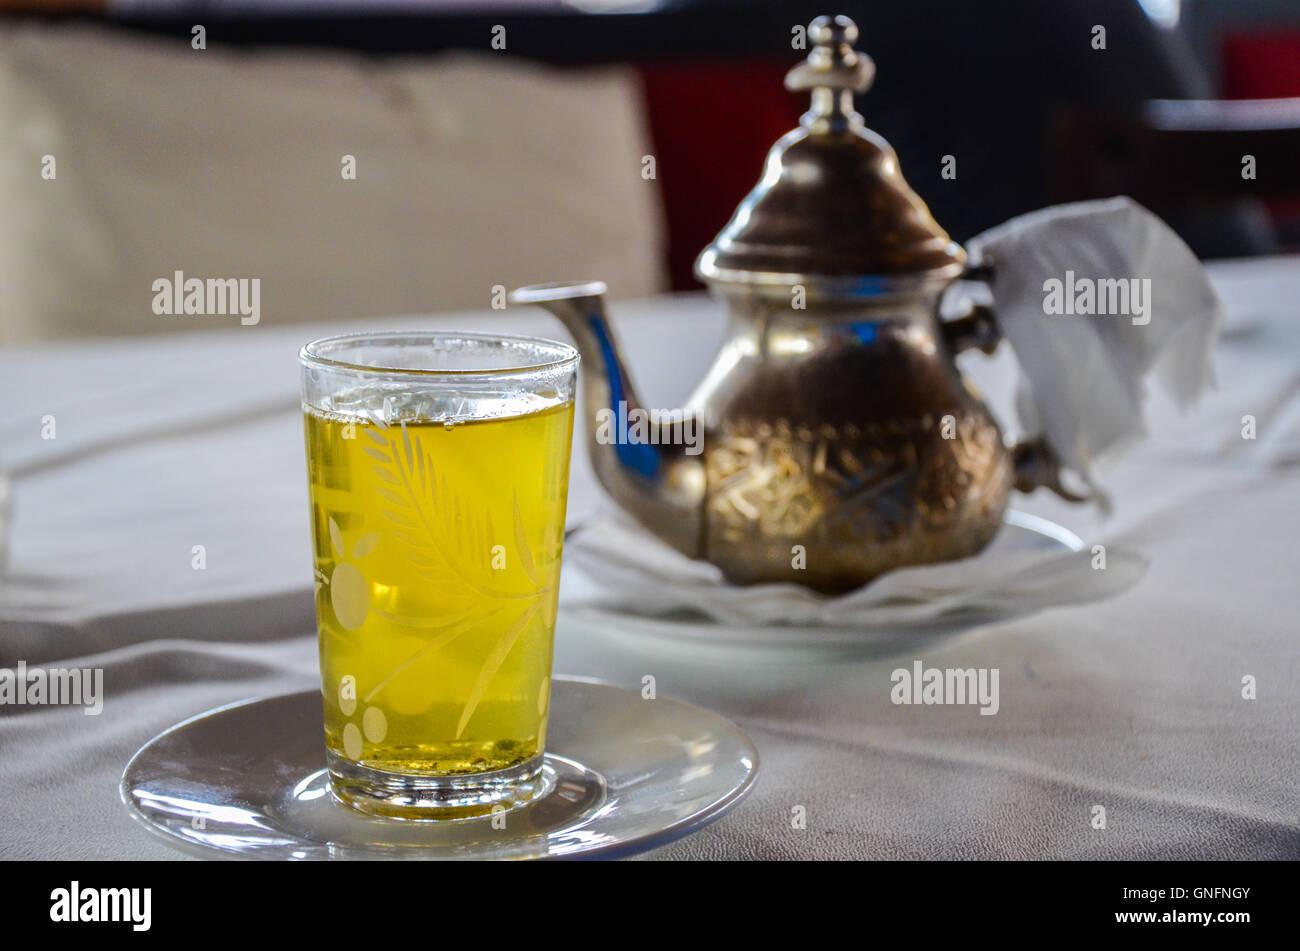 mint tea marrakesh stockfotos mint tea marrakesh bilder alamy. Black Bedroom Furniture Sets. Home Design Ideas